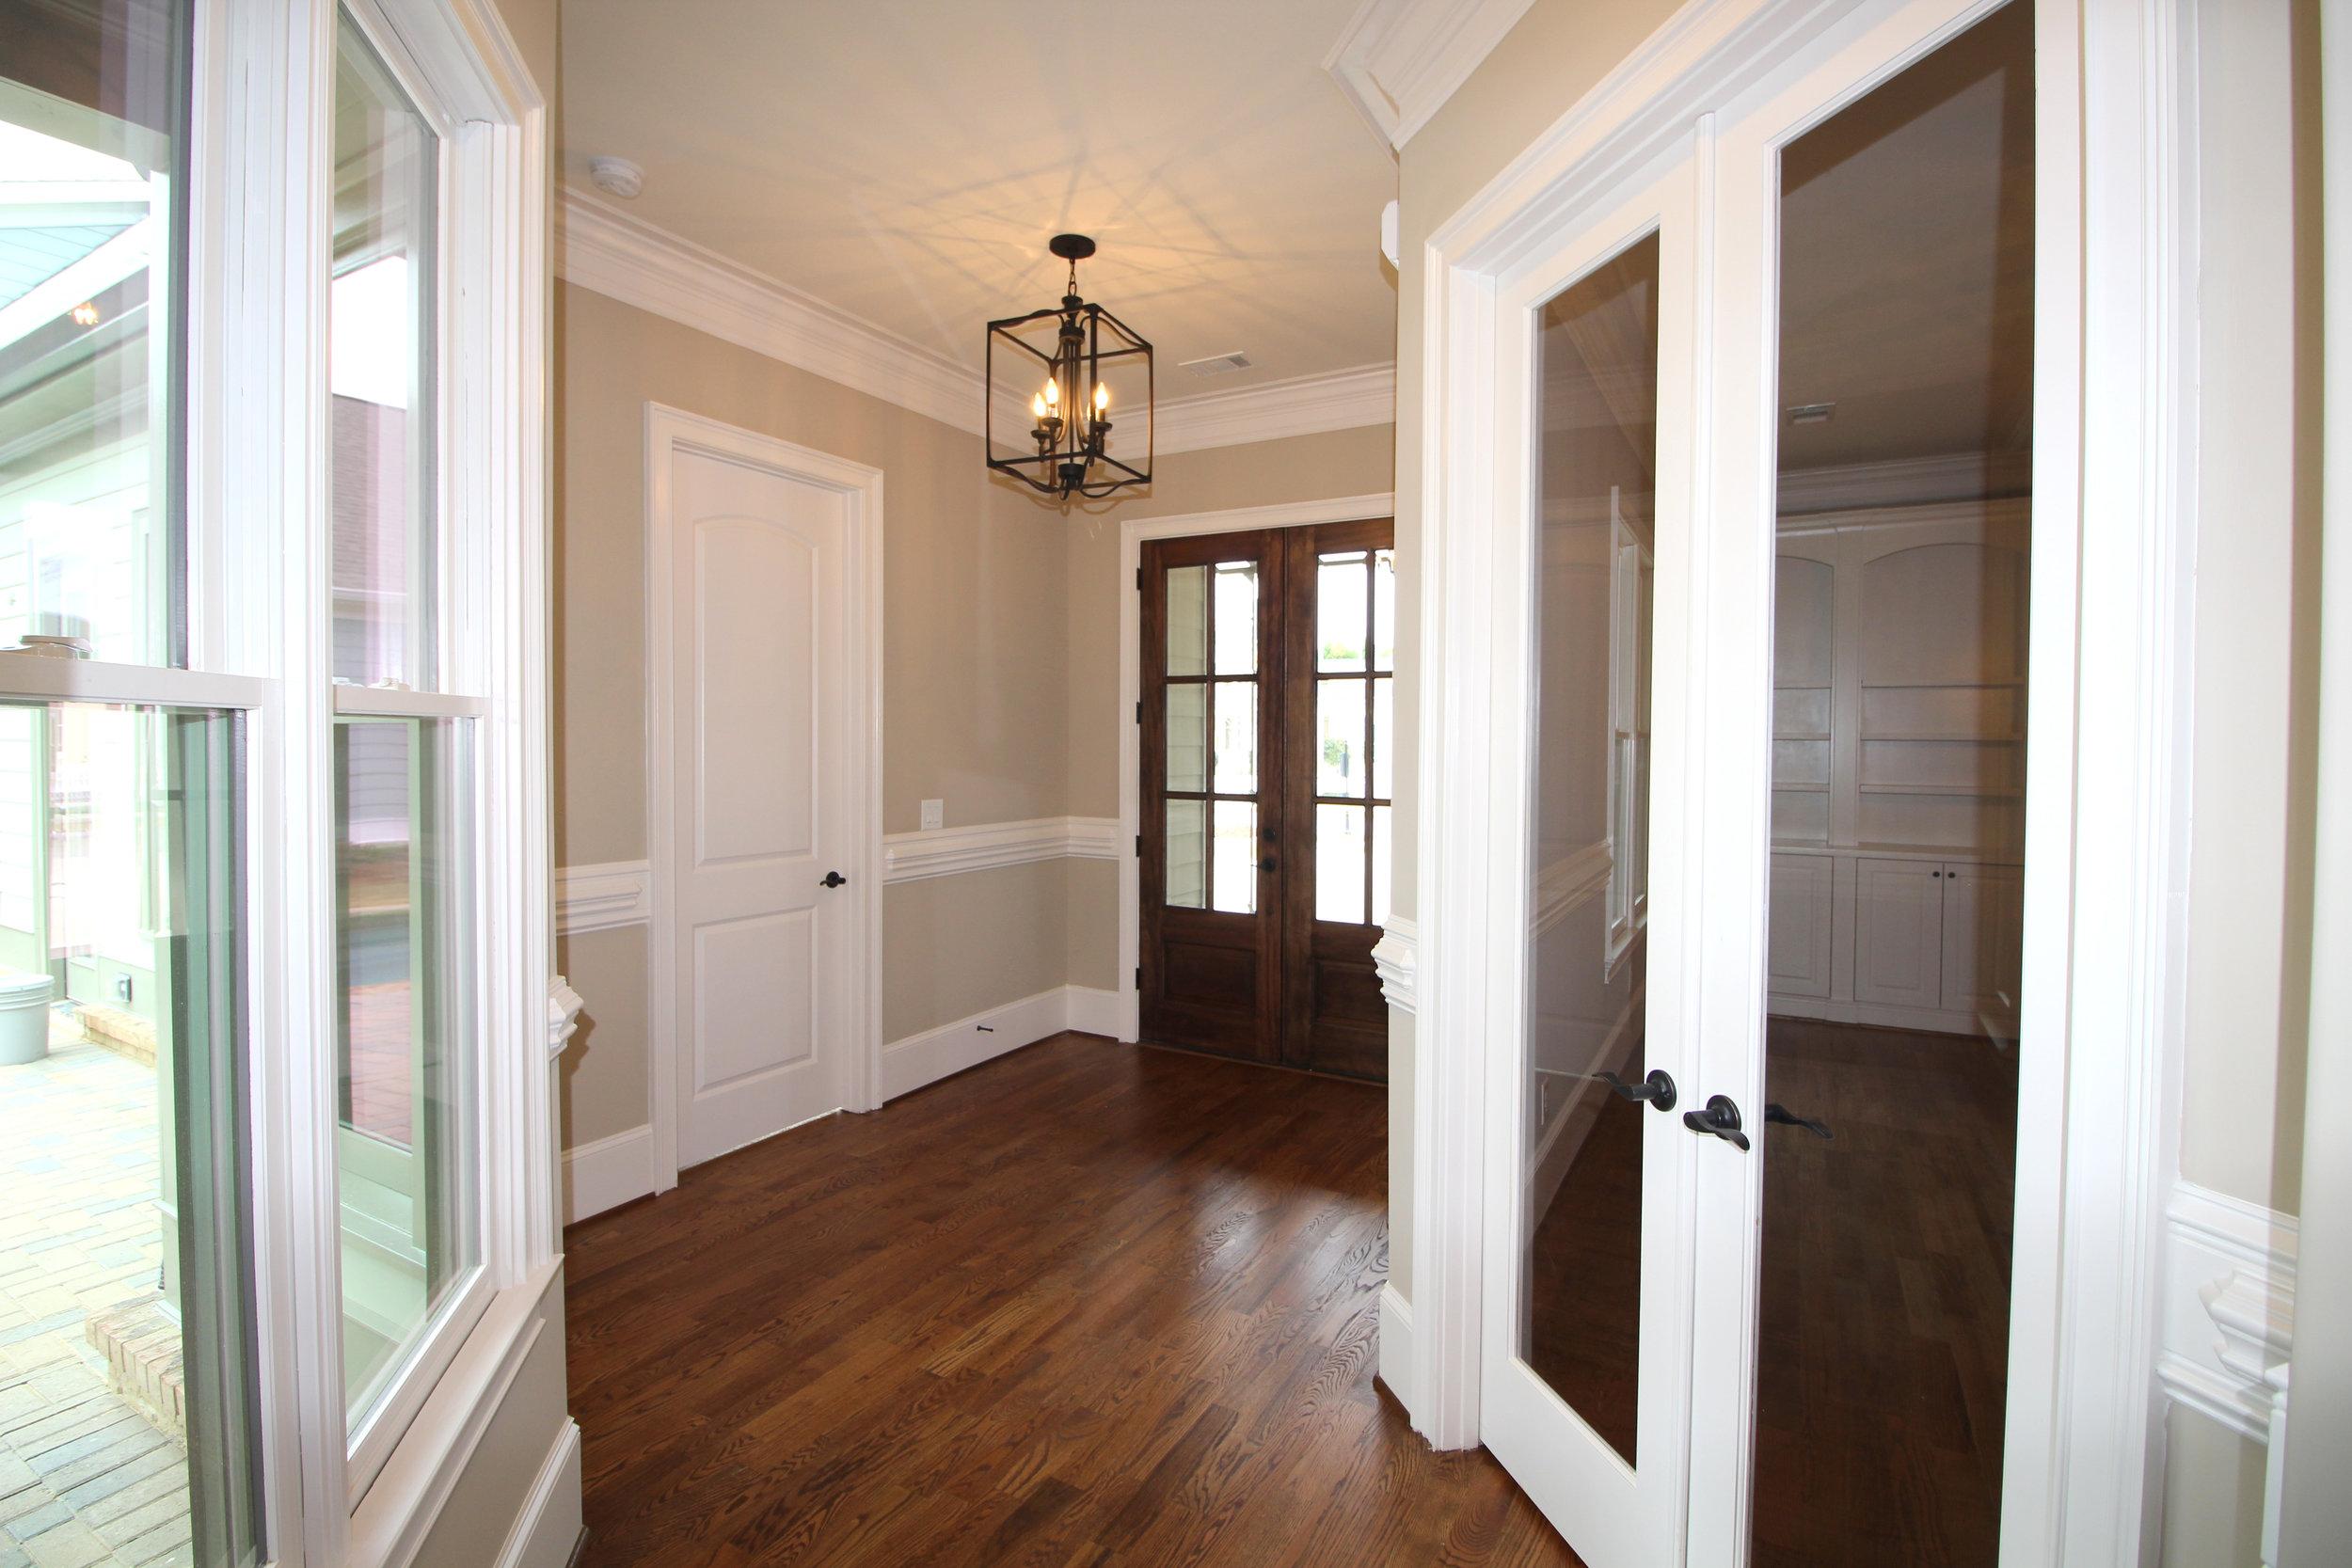 hardwood-floors-throughout-1756-greenleffe-drive-statham-ga-30666-the-georgia-club-oconee-county-oconee-springs-athens-area-home-for-sale-courtyard-homes.JPG